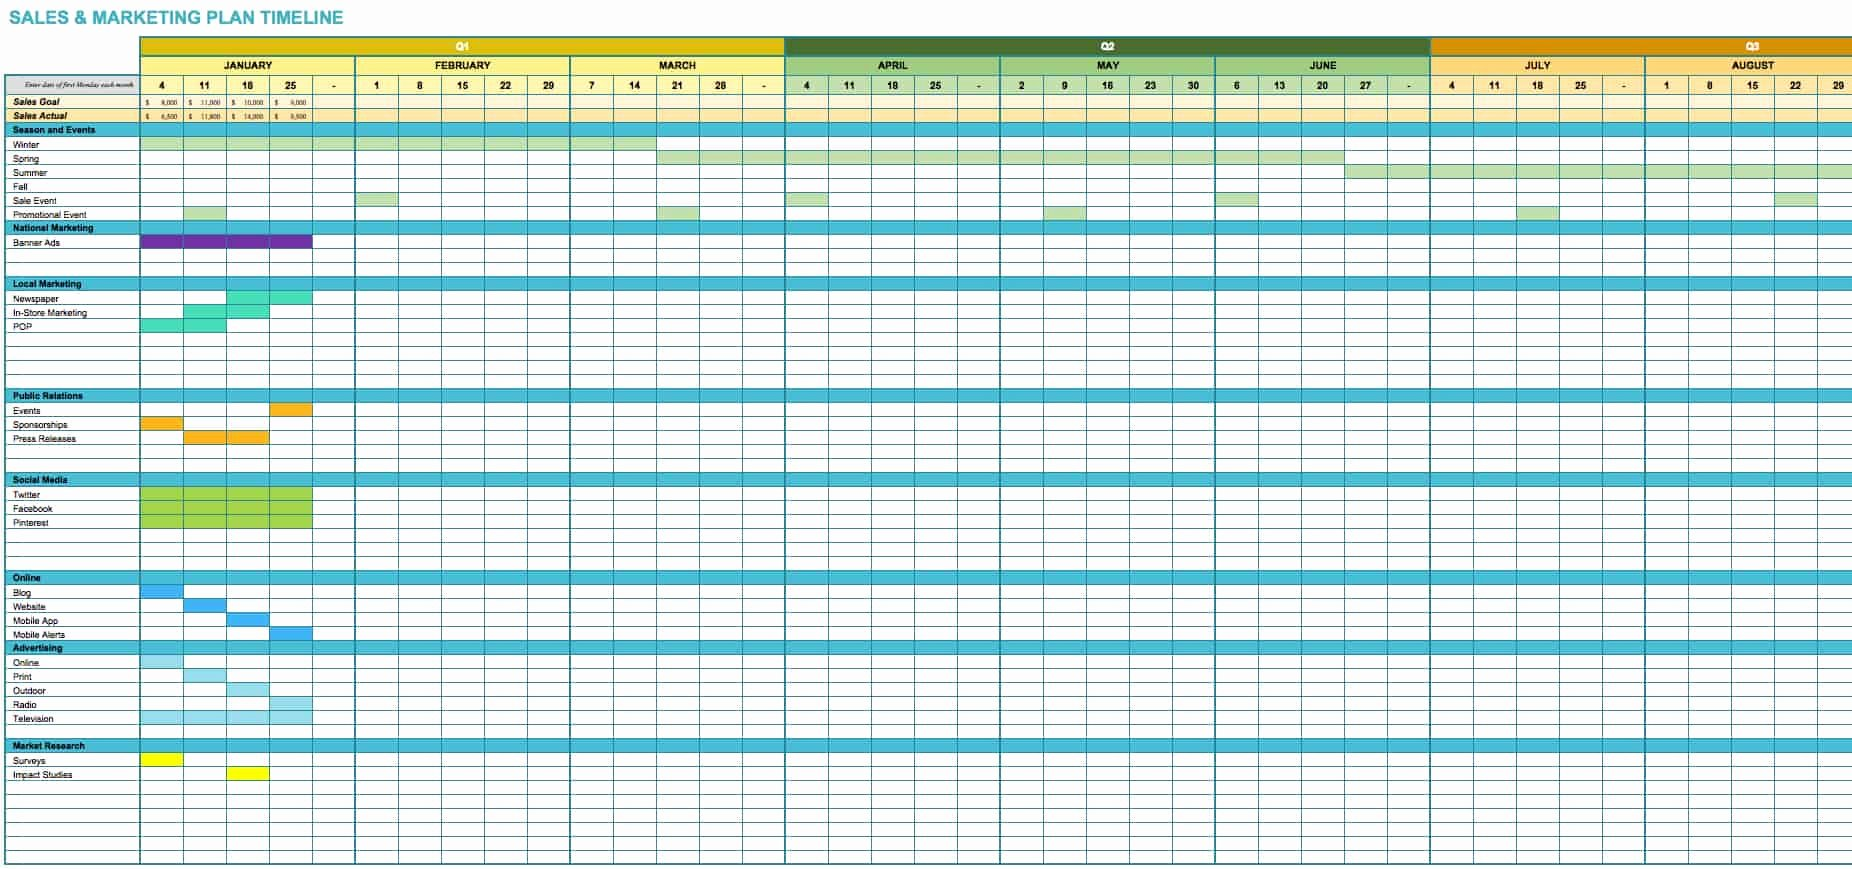 Marketing Timeline Template Excel Luxury Free Marketing Timeline Tips and Templates Smartsheet